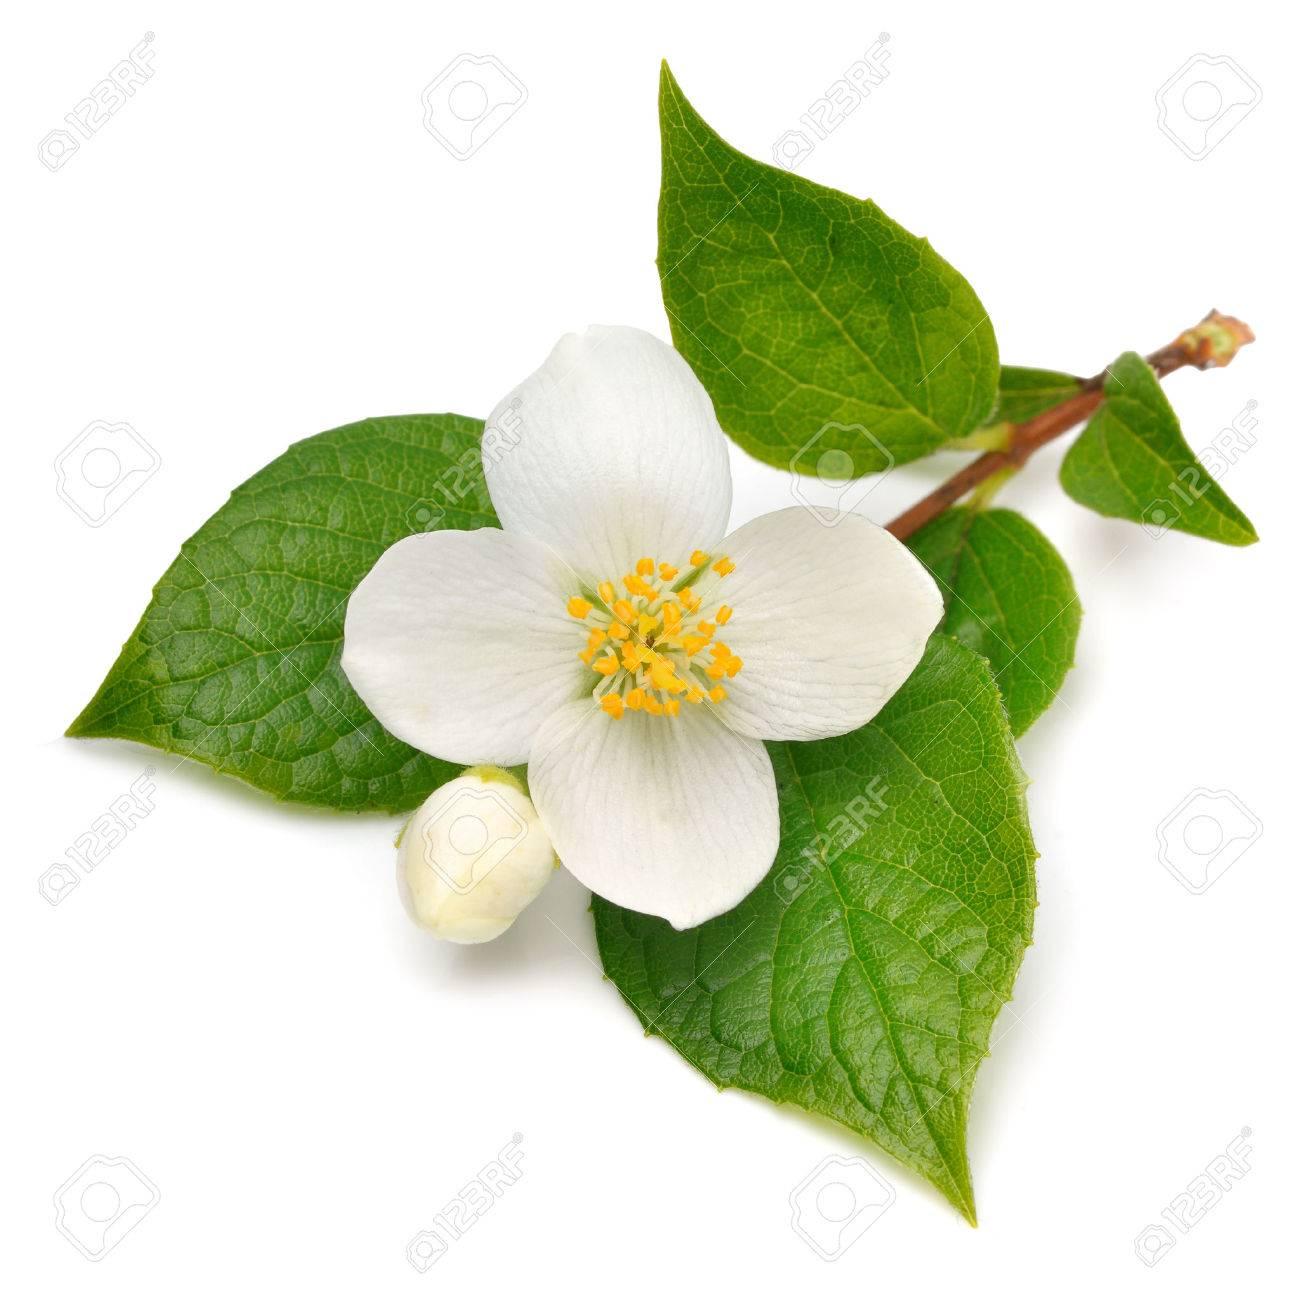 Jasmine flower isolated on white - 36631818